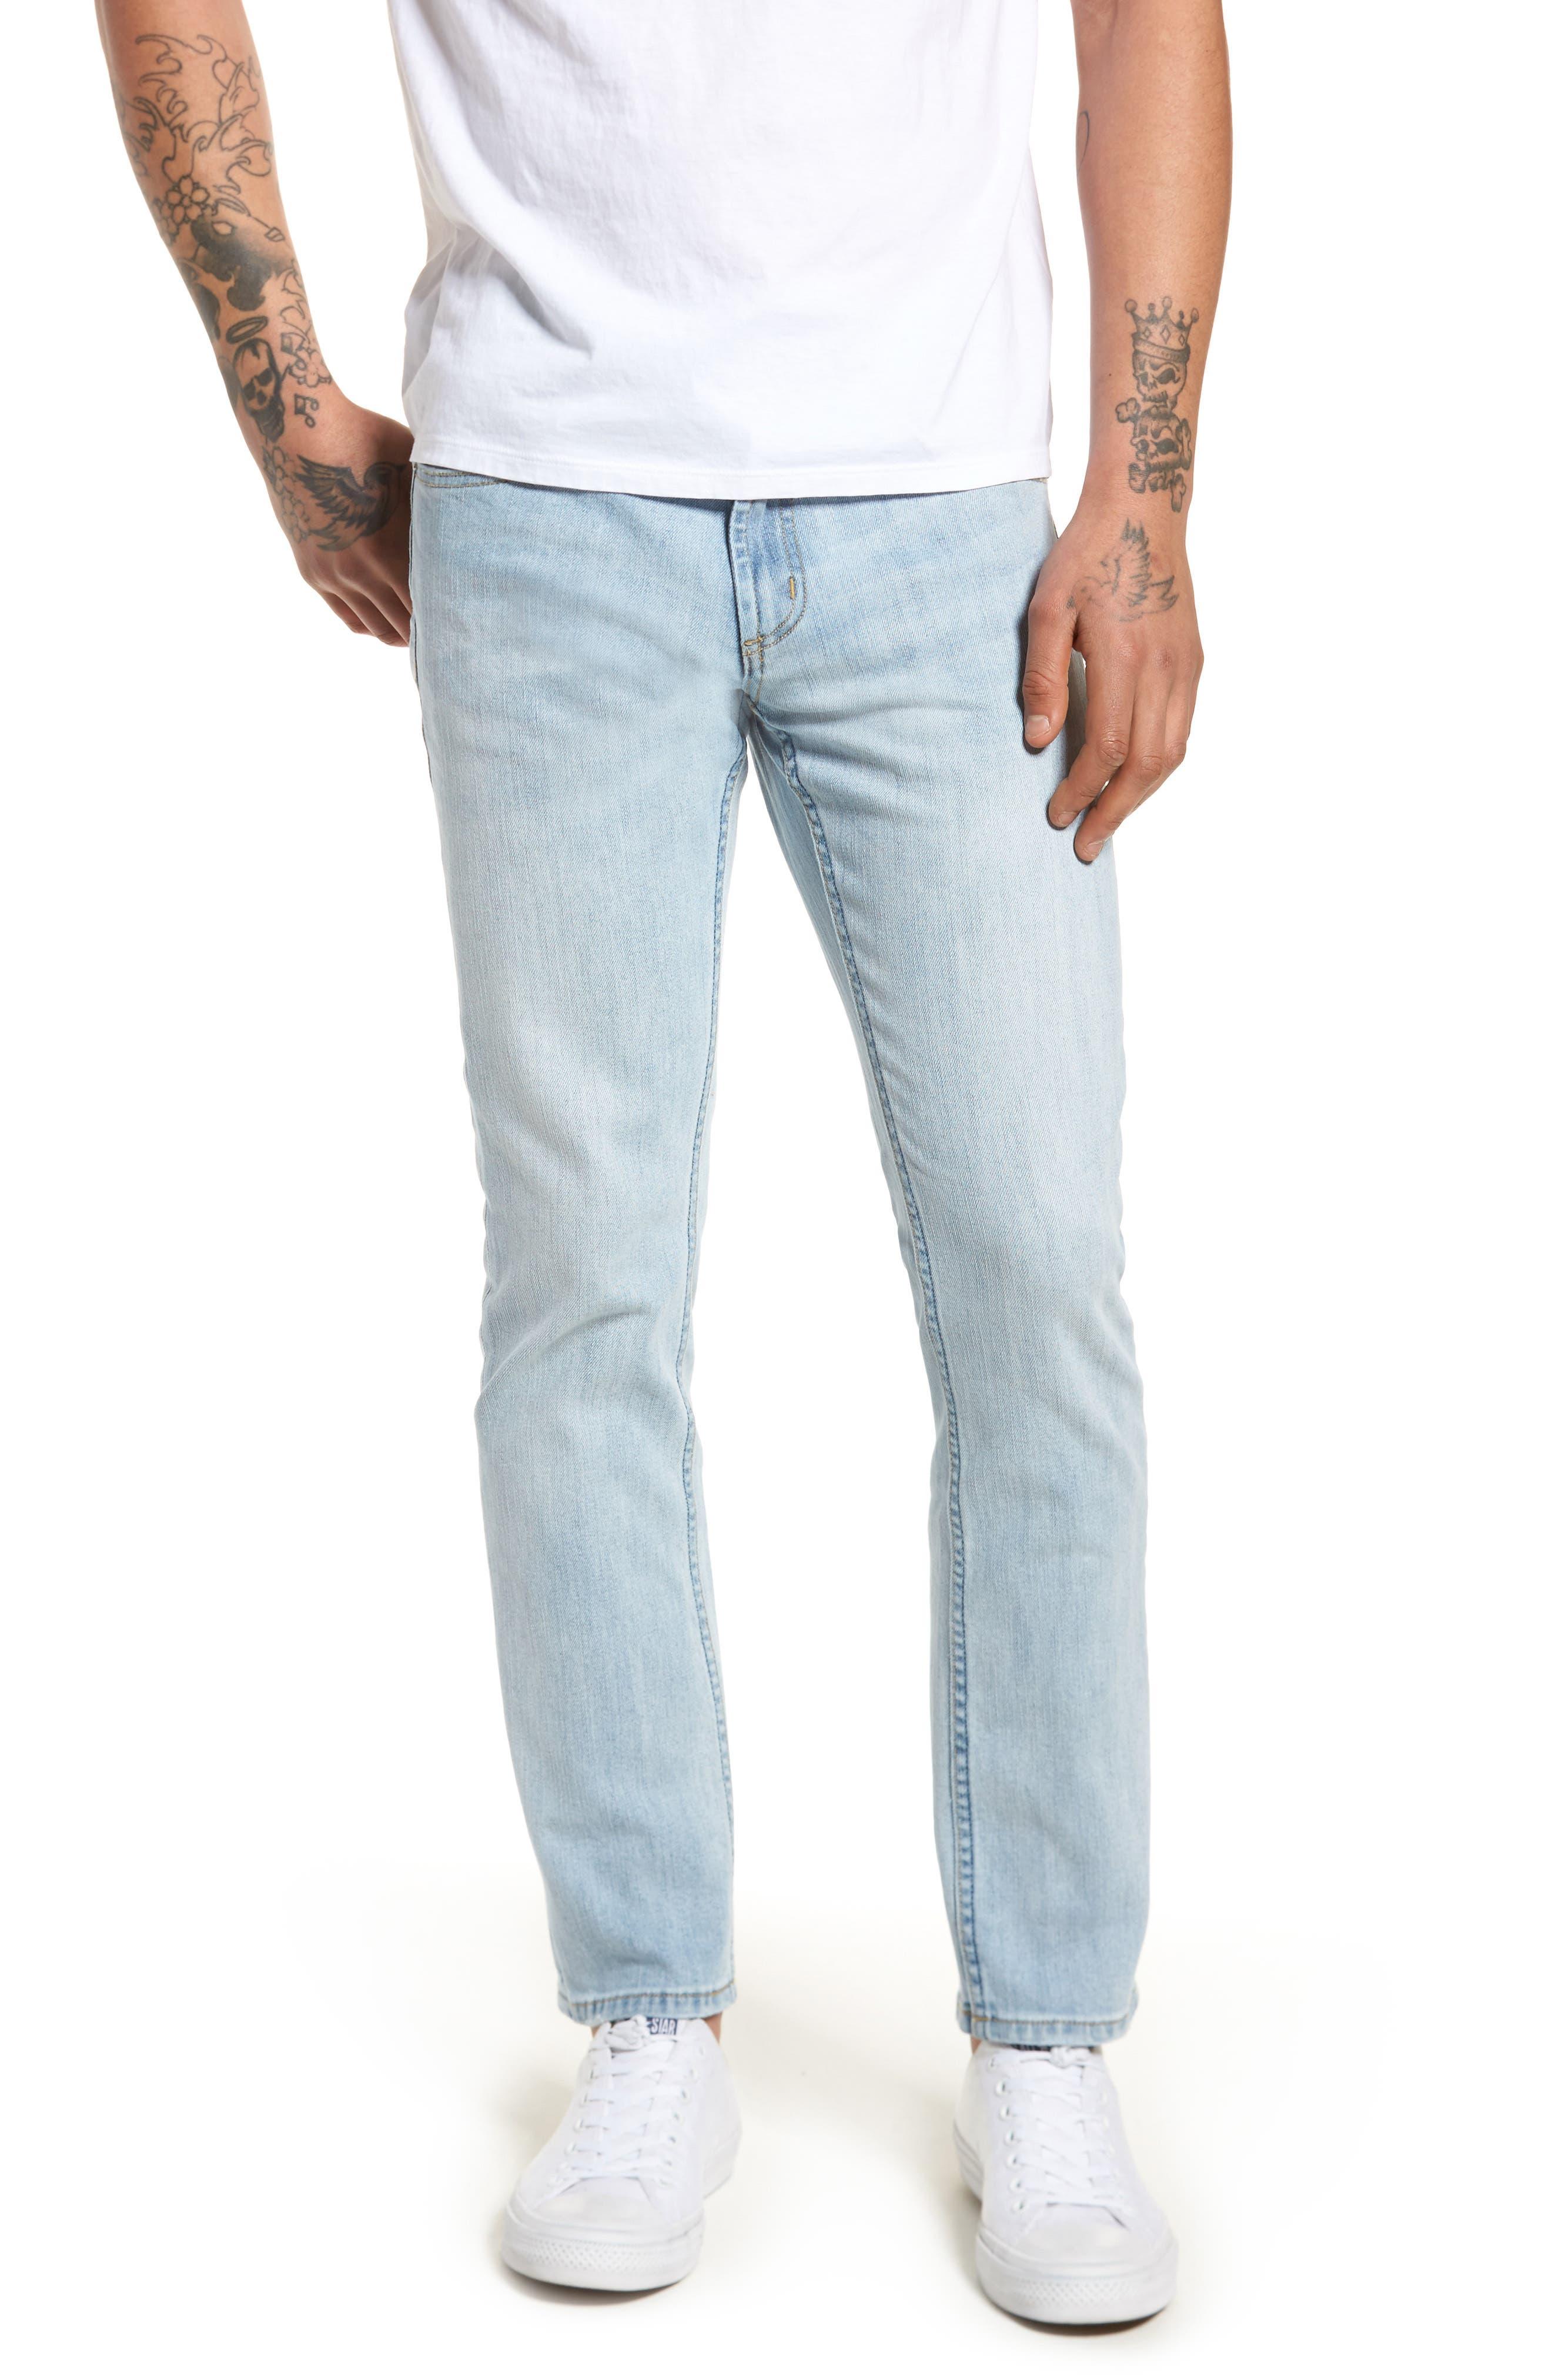 Juvee II Skinny Fit Jeans,                             Main thumbnail 1, color,                             400